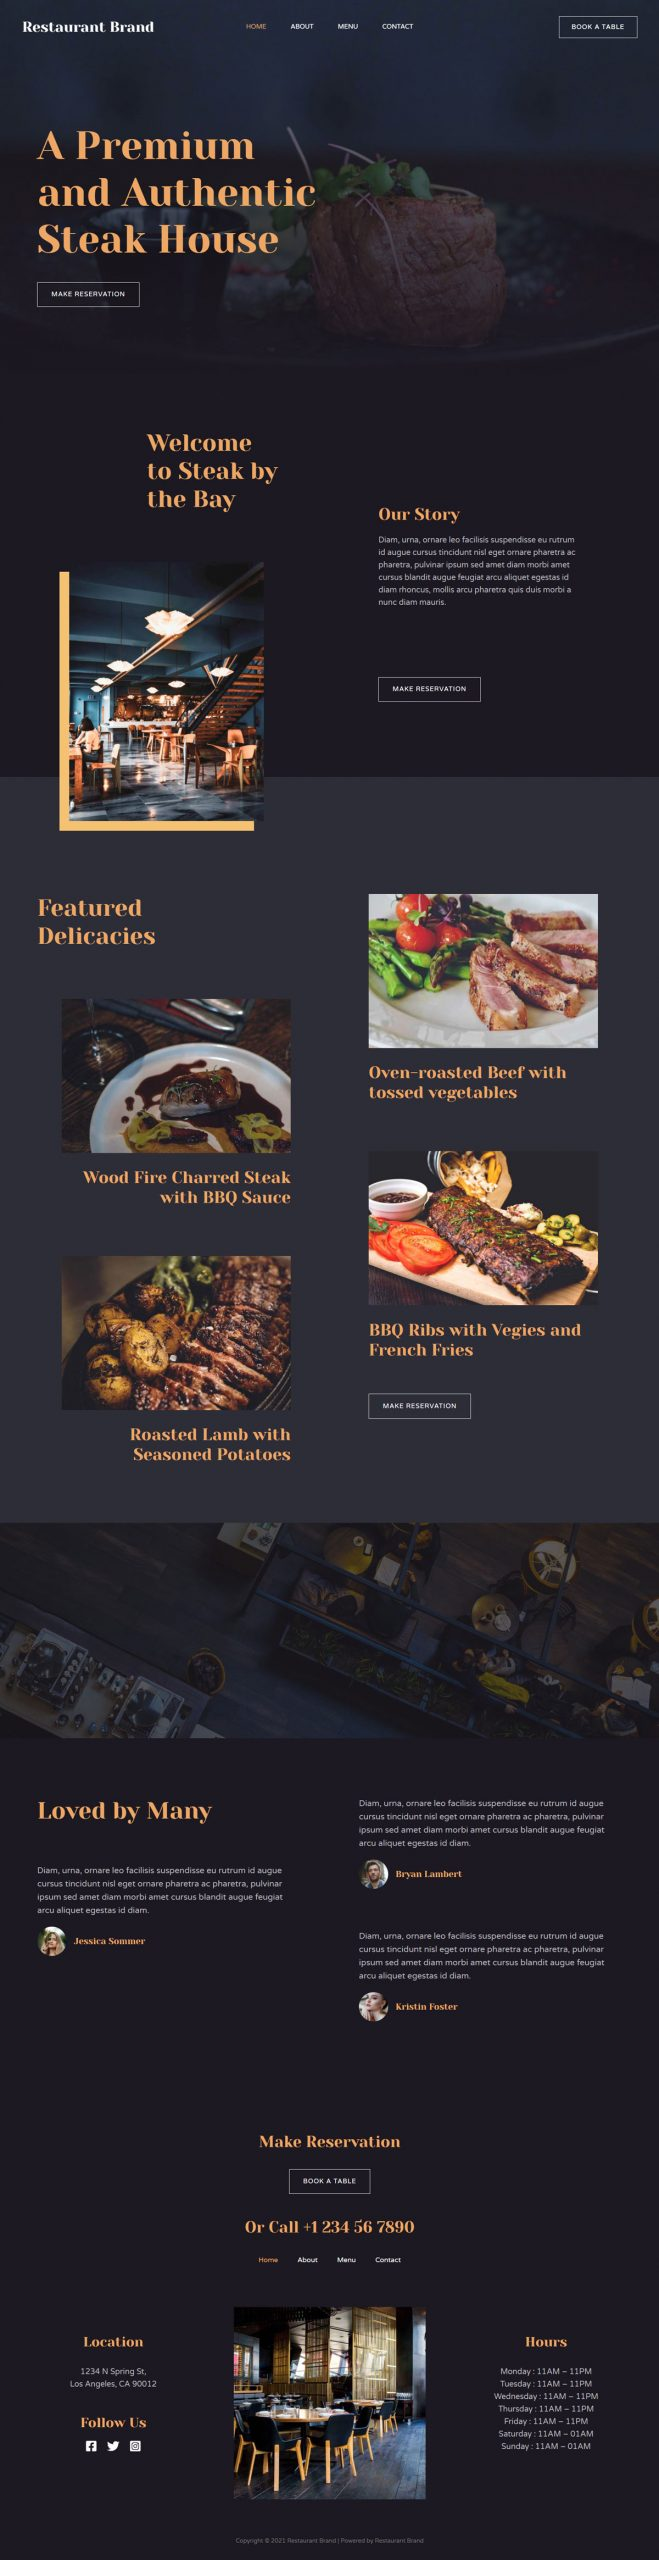 Adamo Web Design | Web Design Durham | steak house 02 home scaled